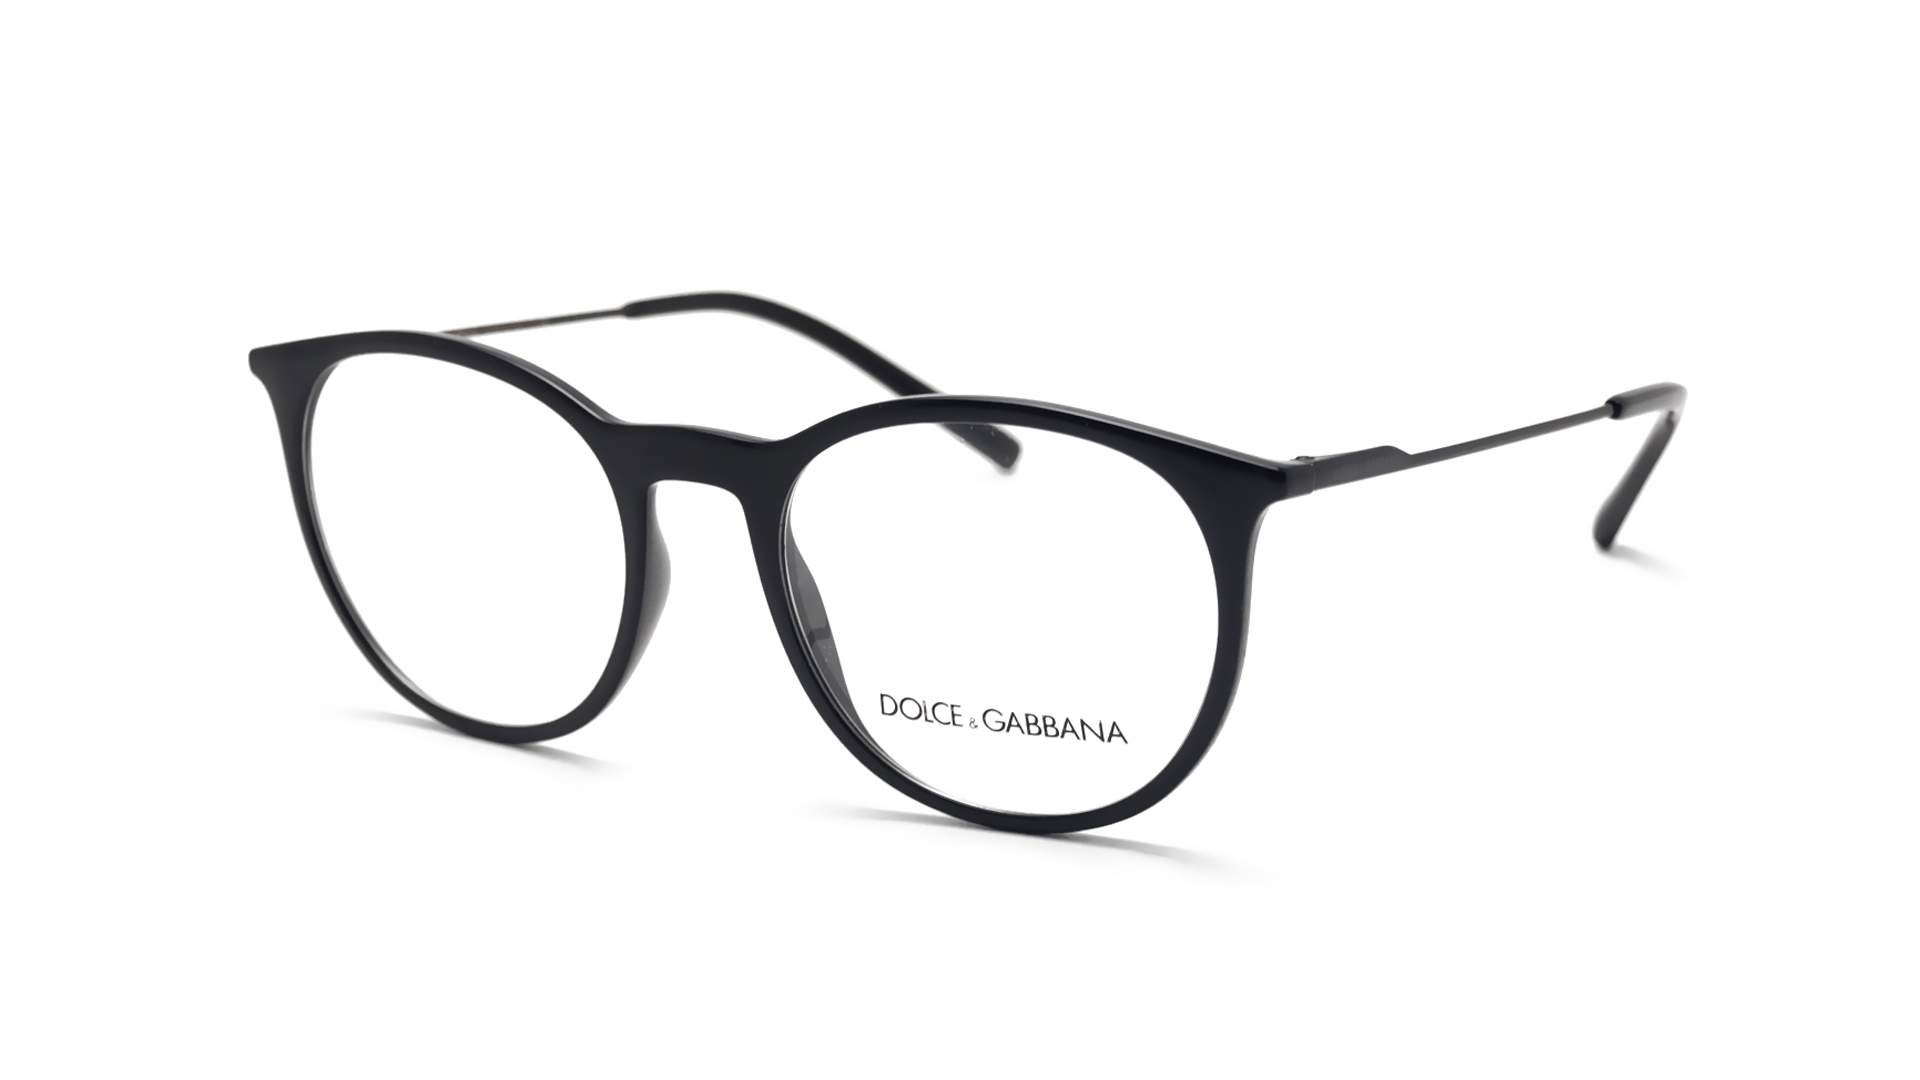 8f97bbf5280 Eyeglasses Dolce   Gabbana DG5031 2525 49-18 Black Matte Medium